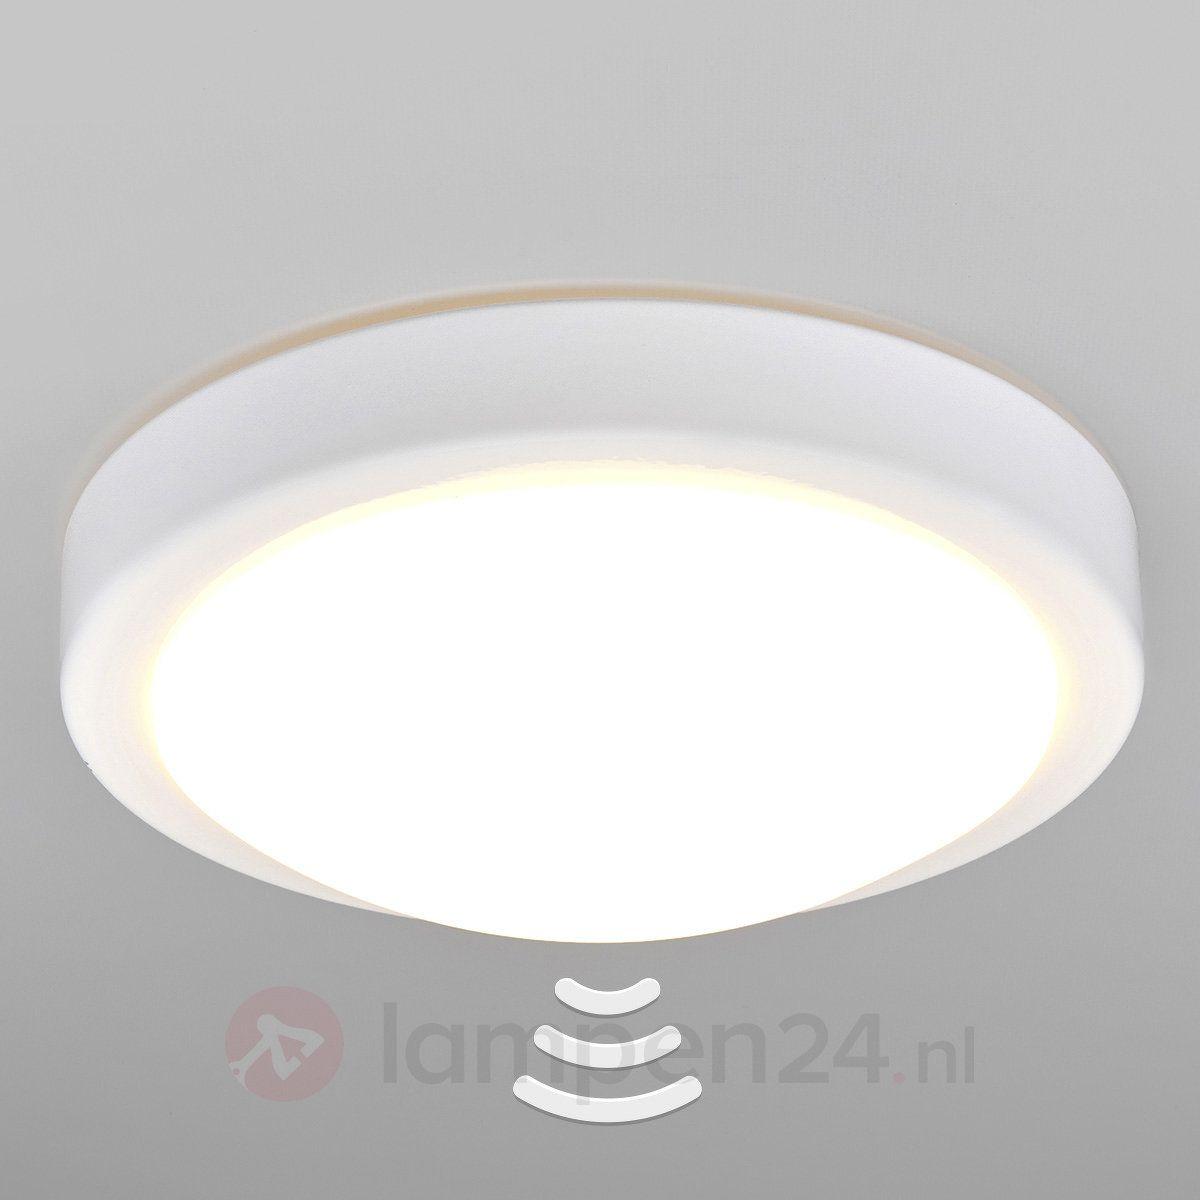 Badkamer-LED-plafondlamp Aras met sensor, wit | Badkamer | Pinterest ...